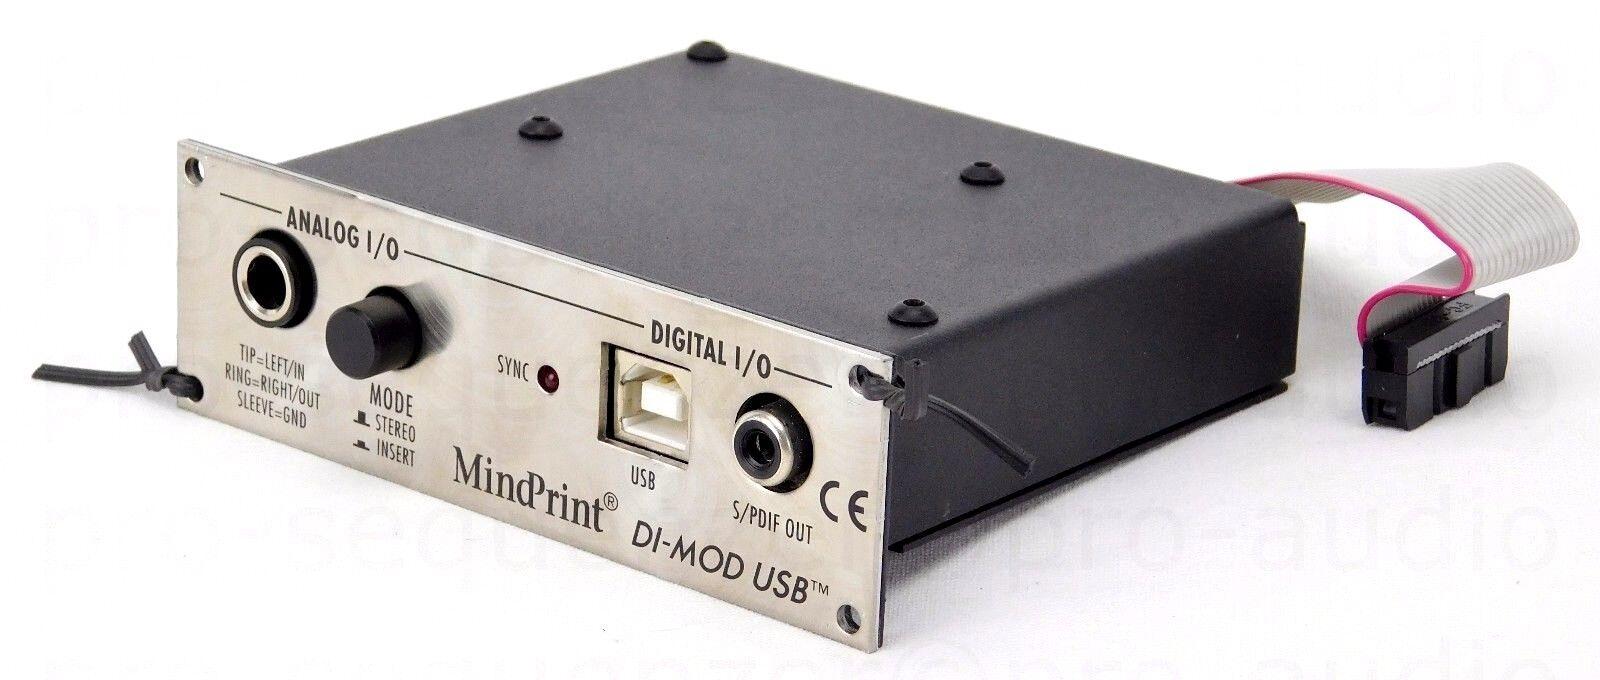 MindPrint DI-MOD USB Stereo ConGrüner 24 bit  96 kHz  110dB(a) + 1.5J Garantie